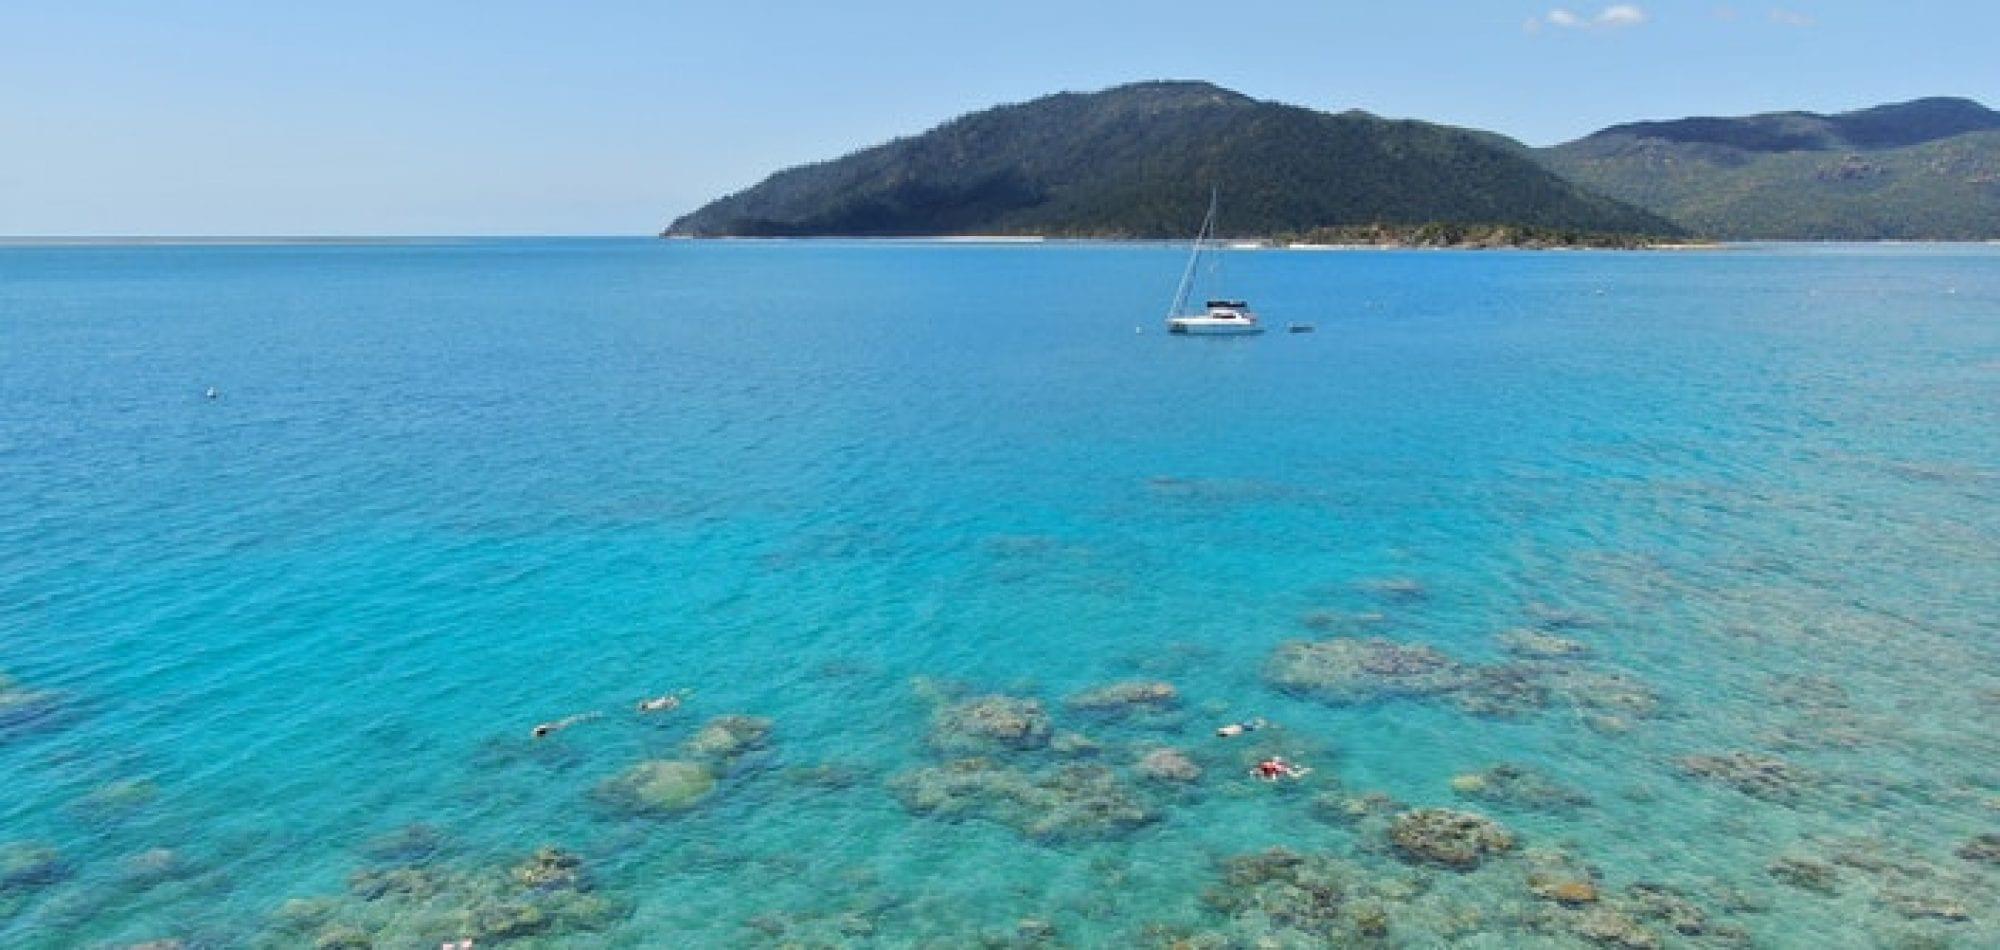 Whitsunday Islands scuba diving adventure - Langford Island